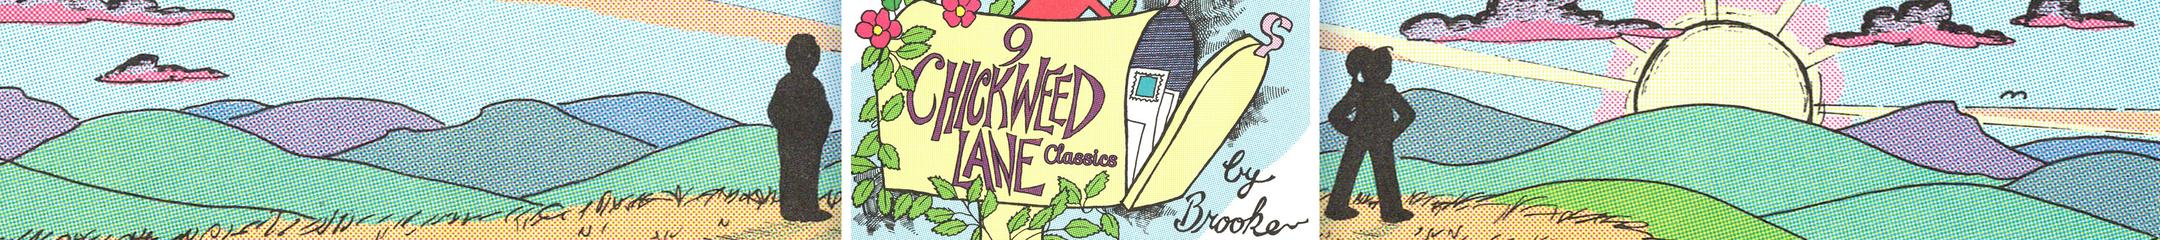 9 Chickweed Lane Classics